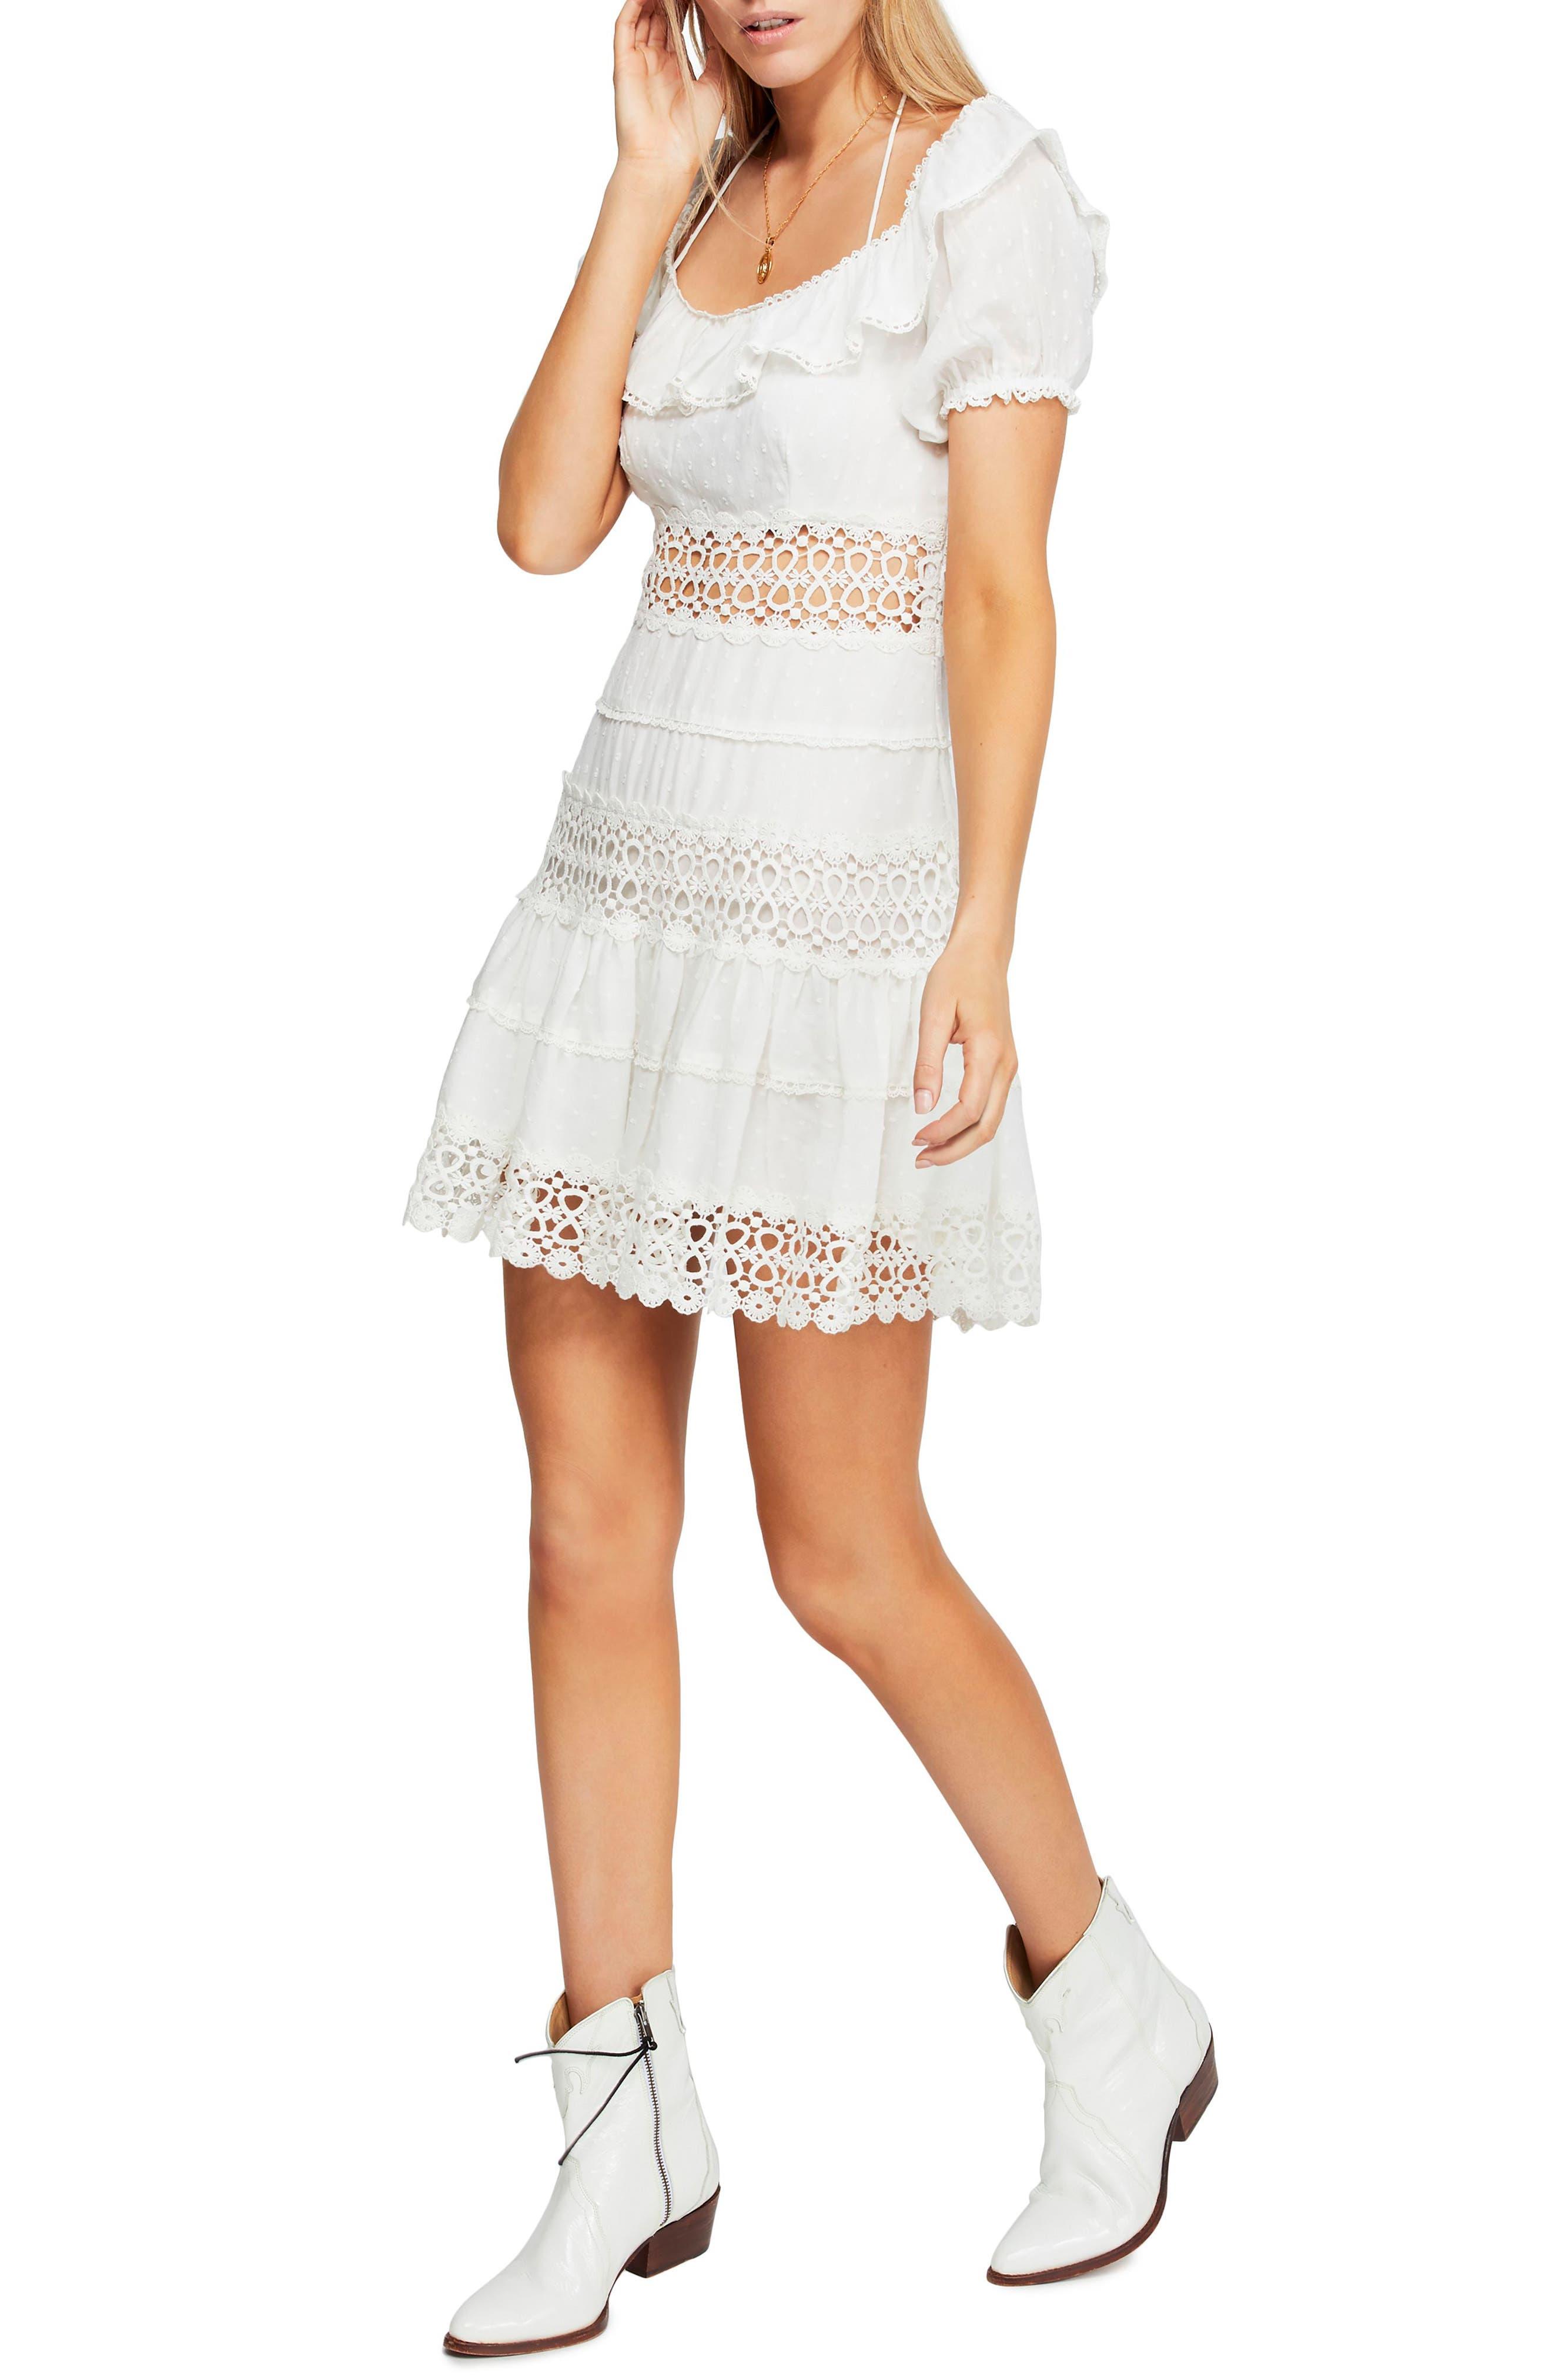 Free People Lace Minidress, Ivory